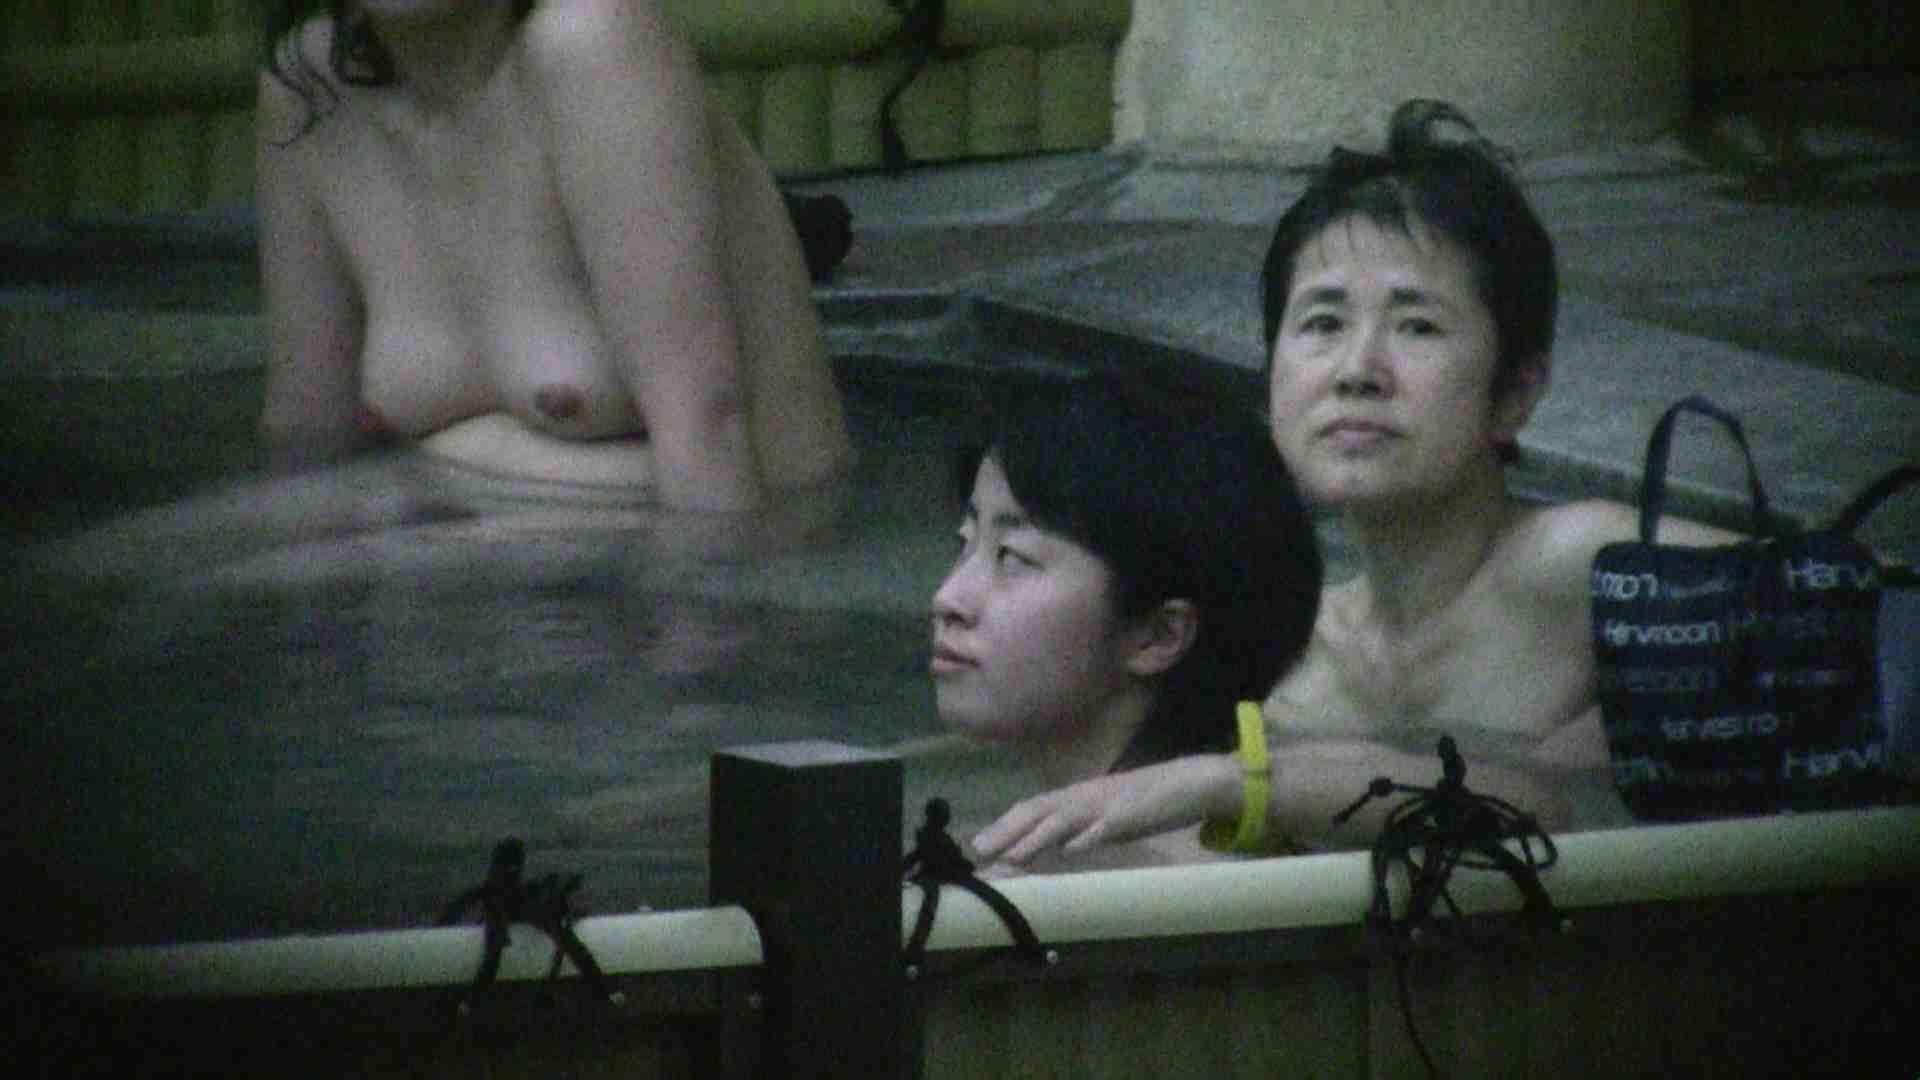 Aquaな露天風呂Vol.112 0  68連発 4